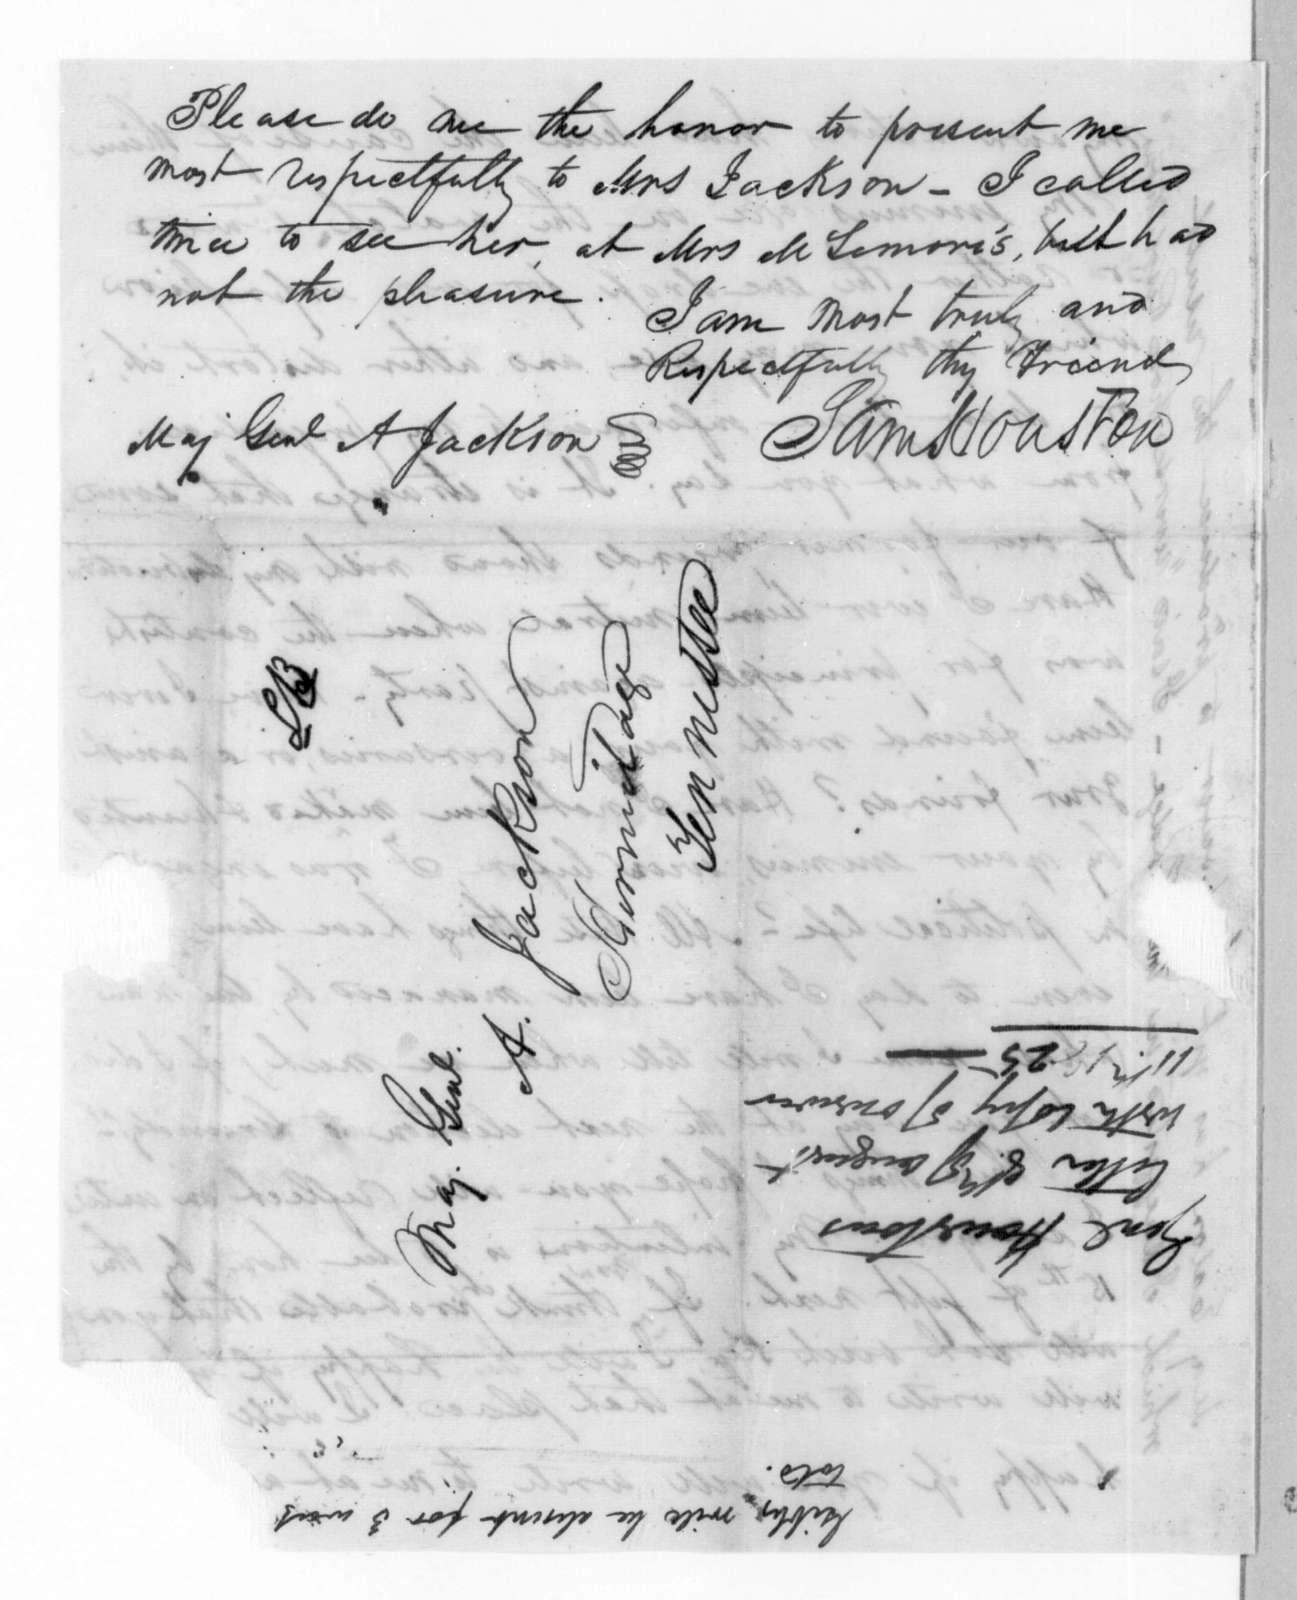 Samuel Houston to Andrew Jackson, August 8, 1825